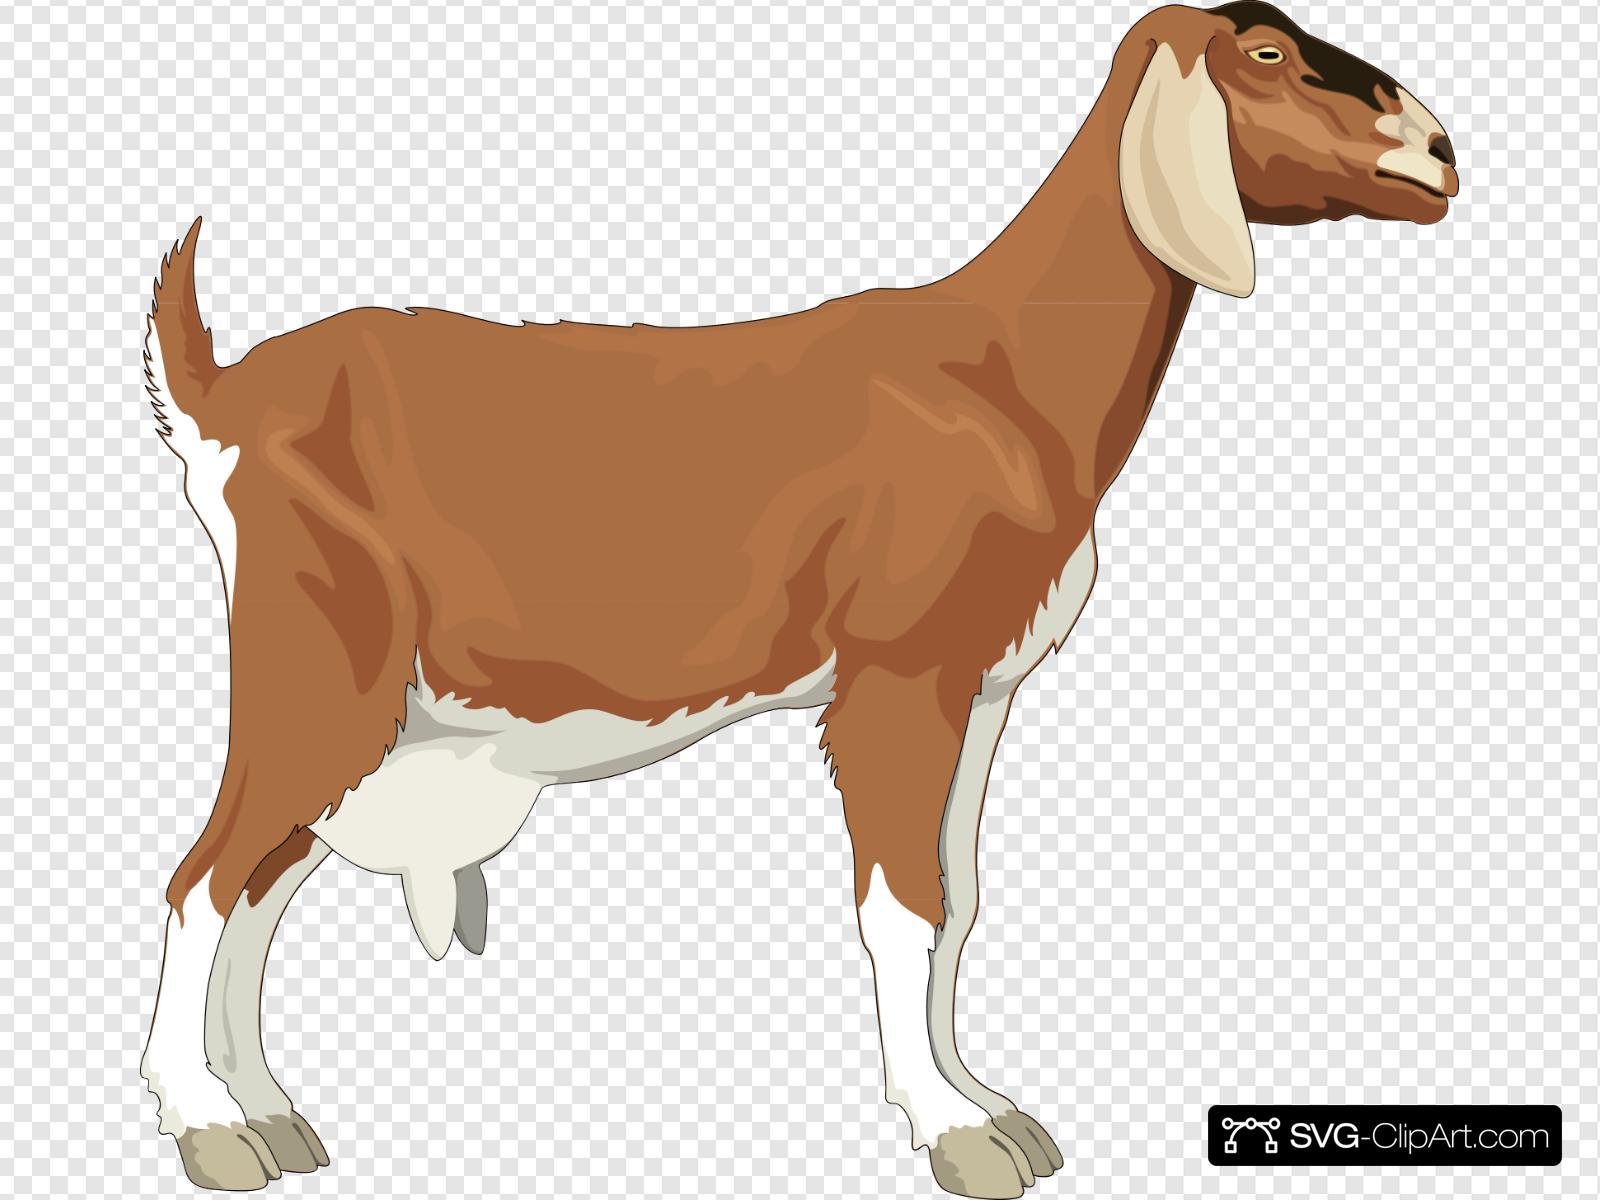 Clip art icon and. Goat clipart colour